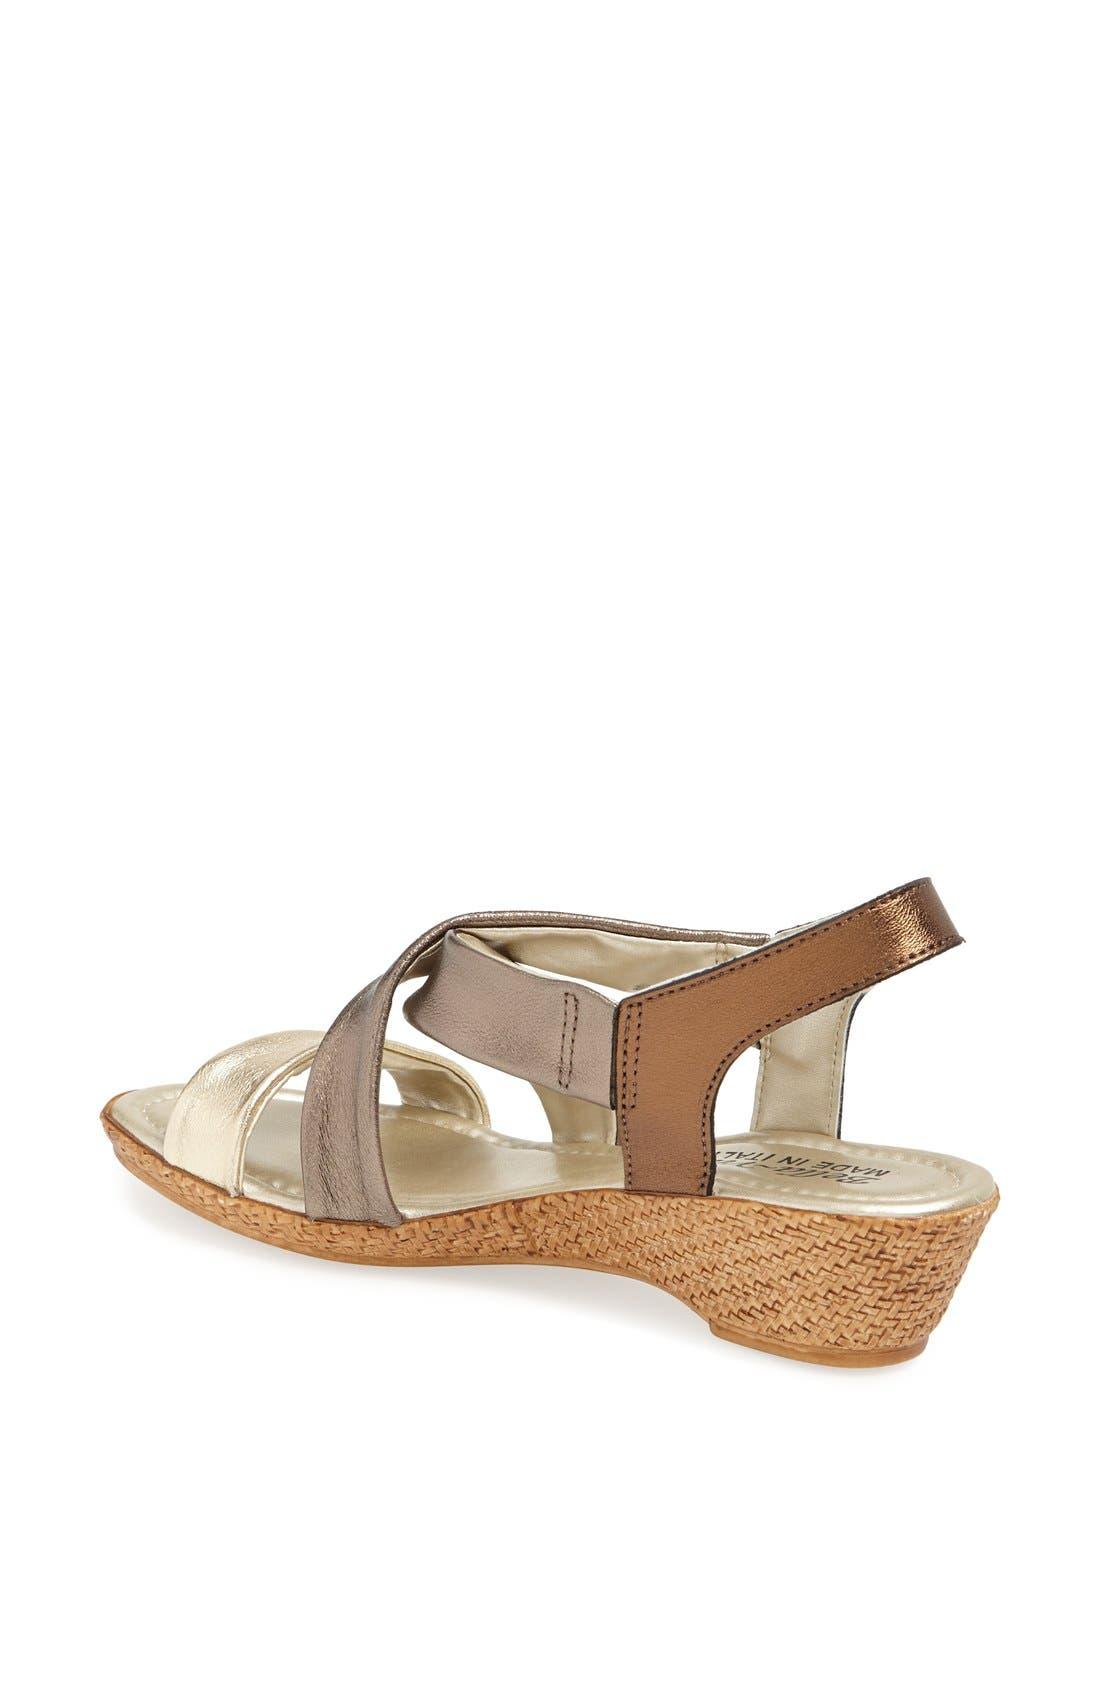 Alternate Image 2  - Bella Vita 'Ciao' Wedge Sandal